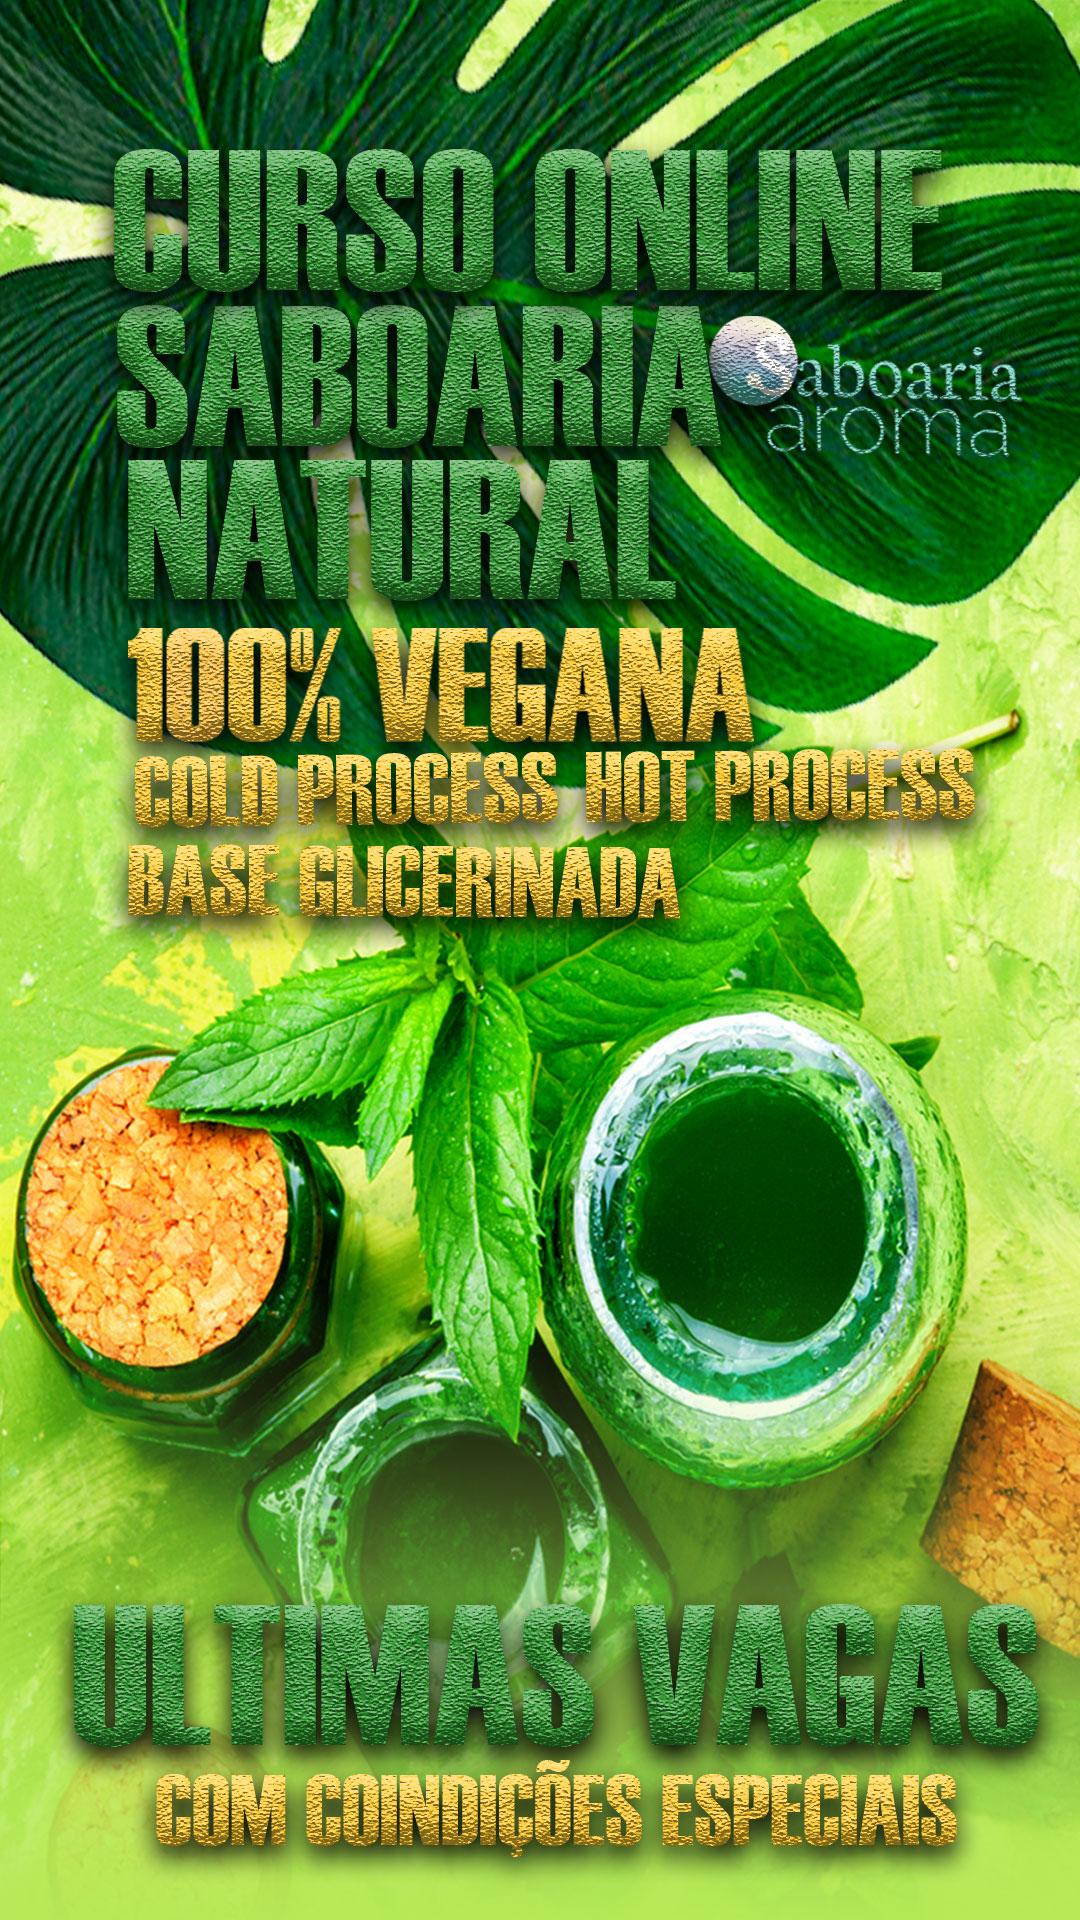 Curso de Saboaria Natural Vegana